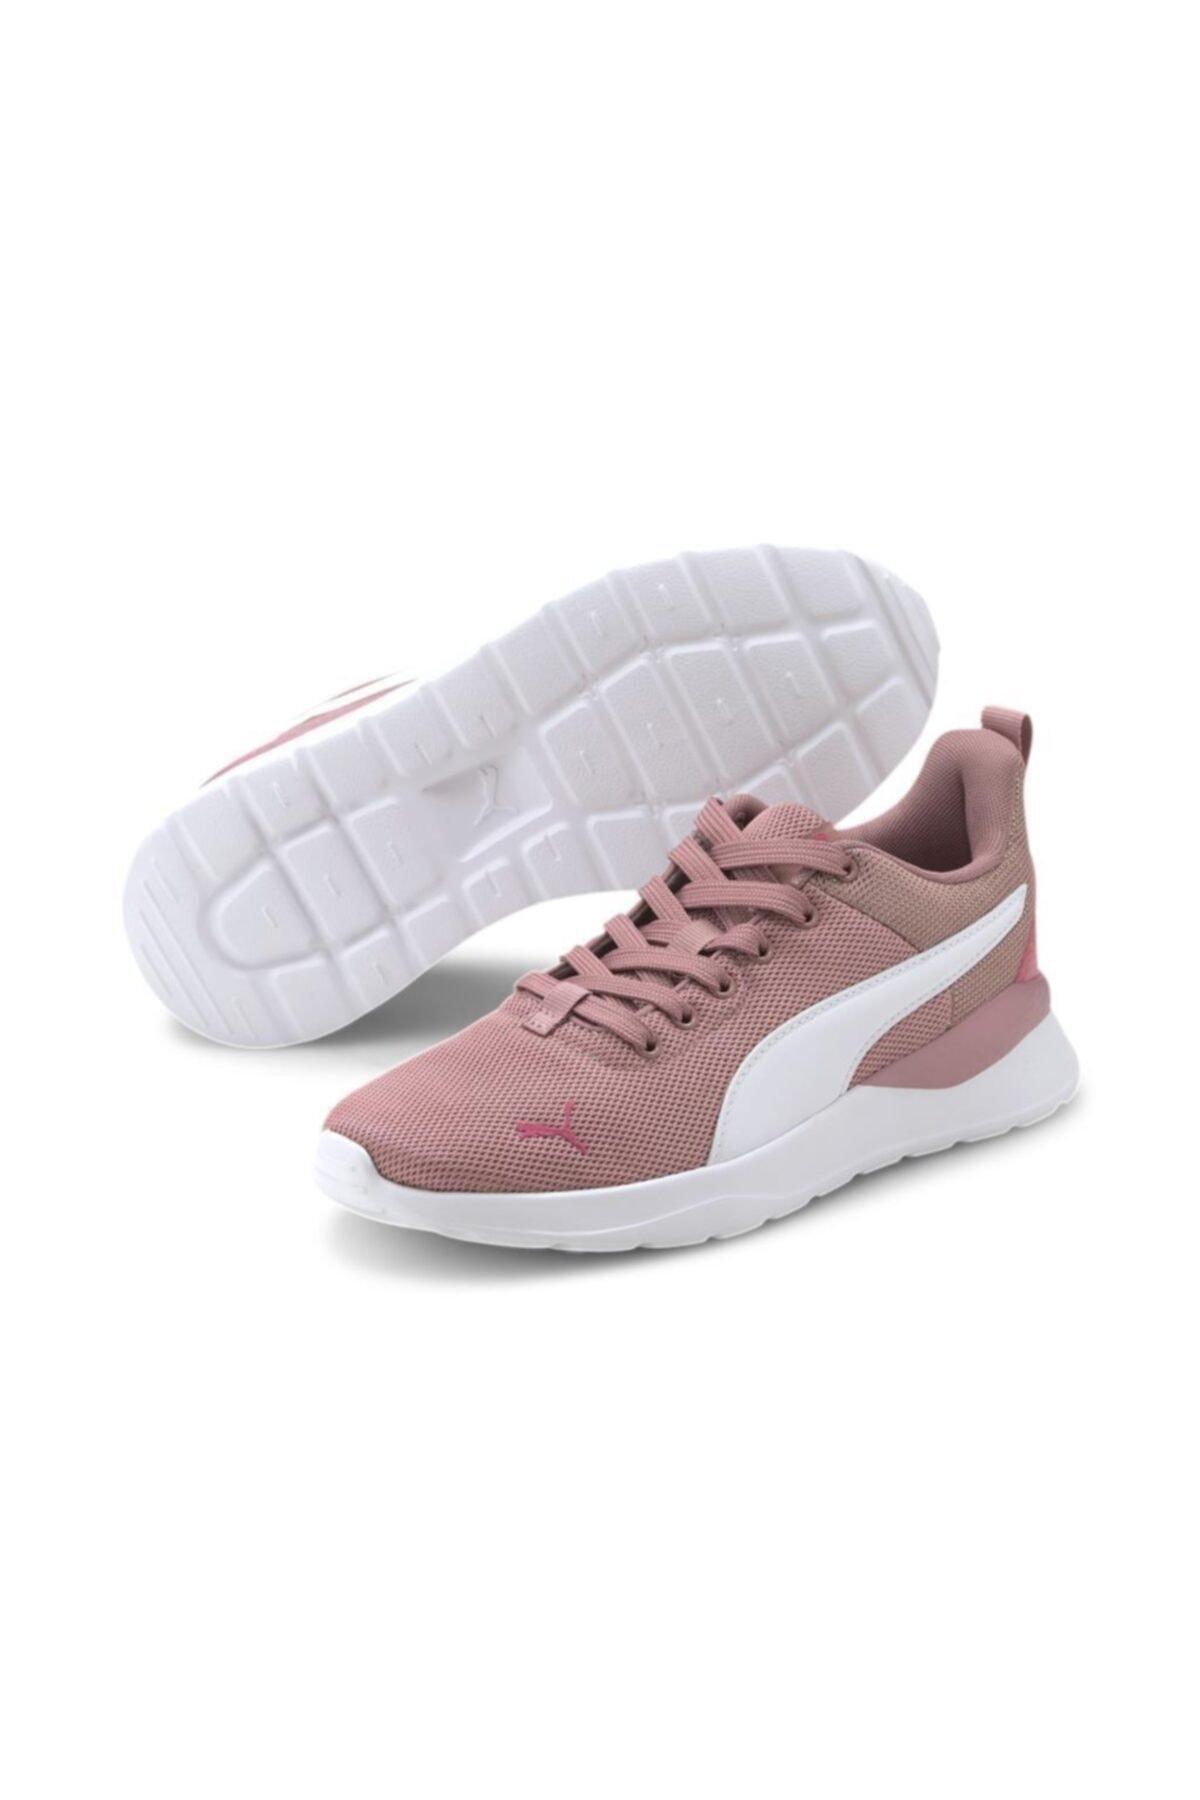 Puma 373174 01 Anzarun Lite Metallic Jr Kadın Sneaker Ayakkabı Pembe 2